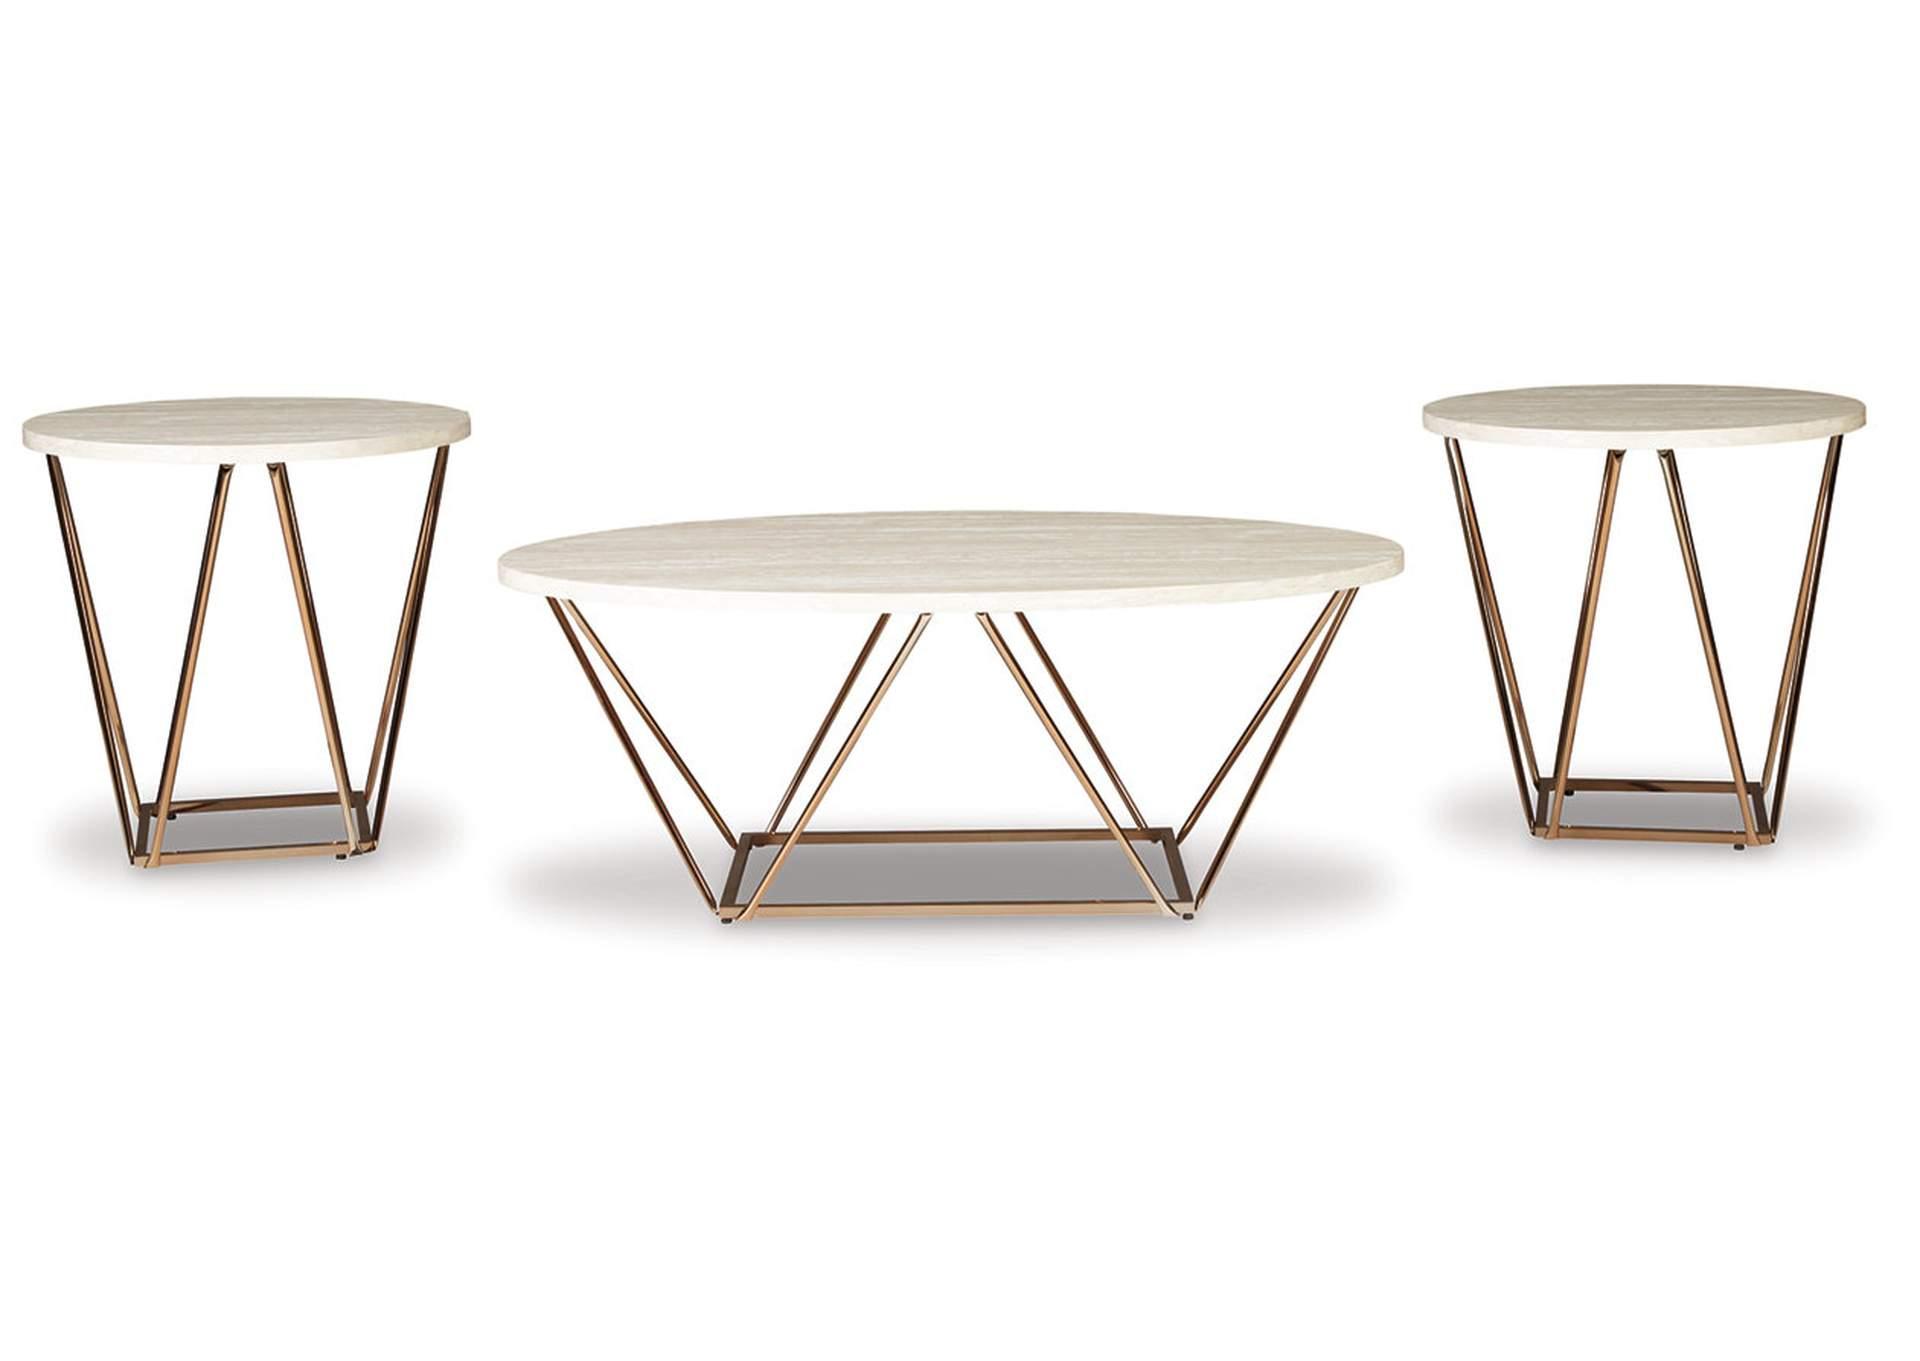 Tarica Table (Set of 3)